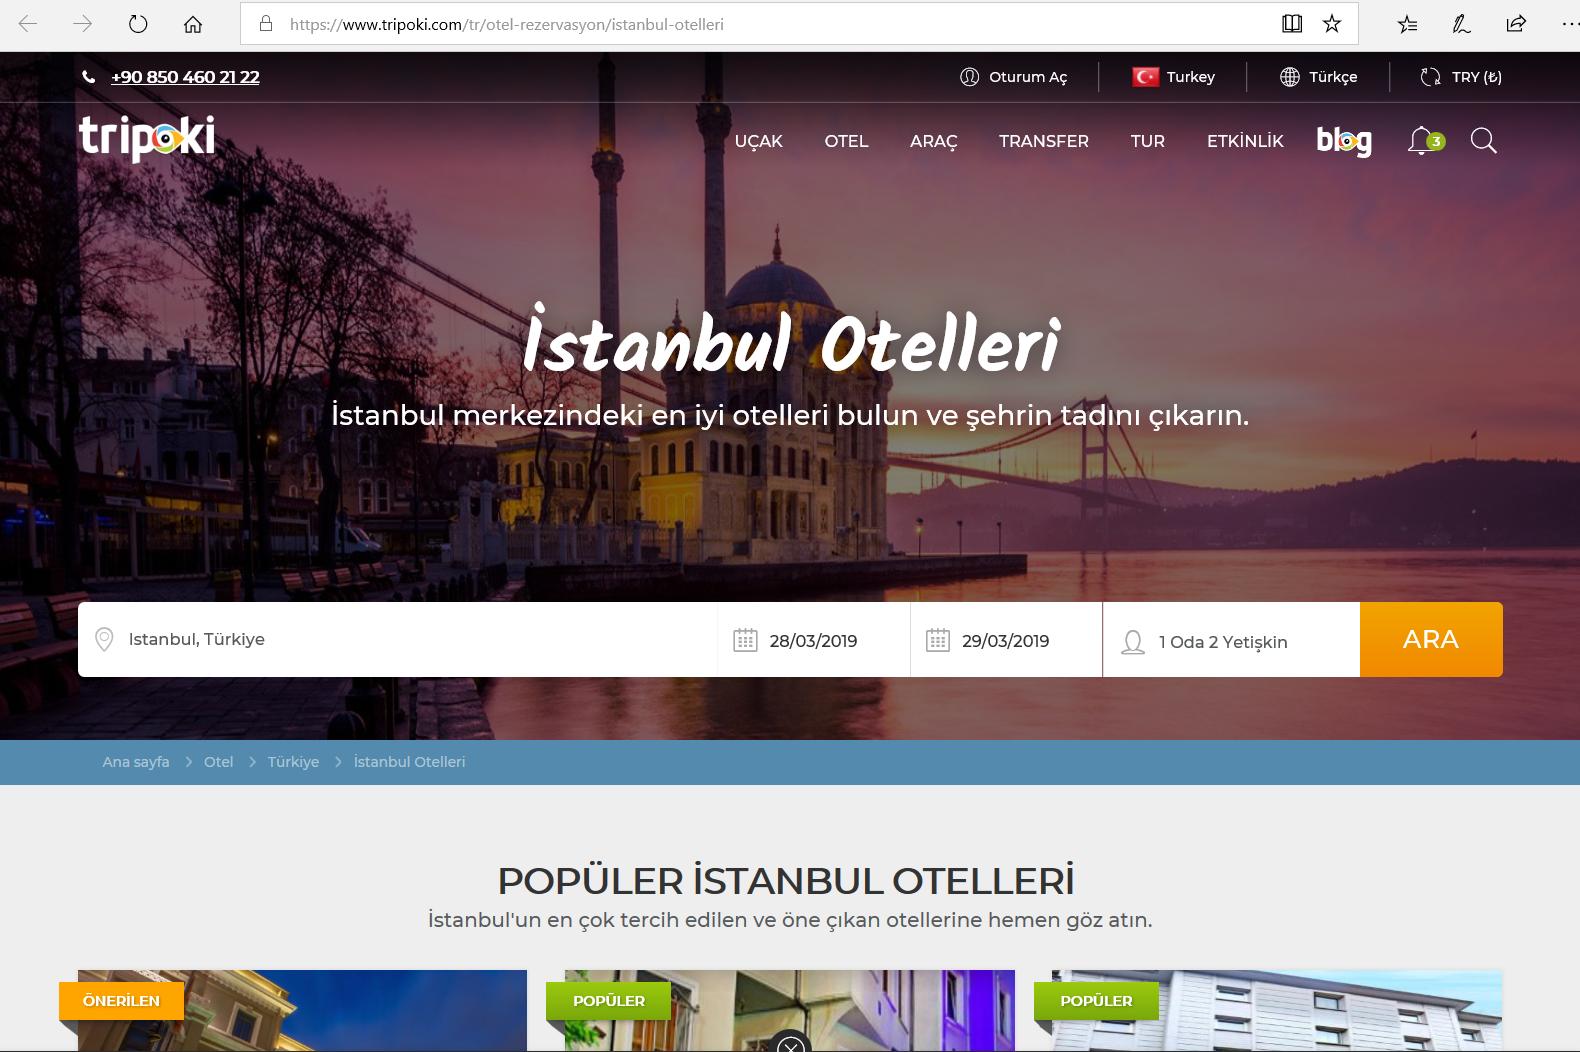 İstanbul Otelleri Konforda Üst Sıralarda